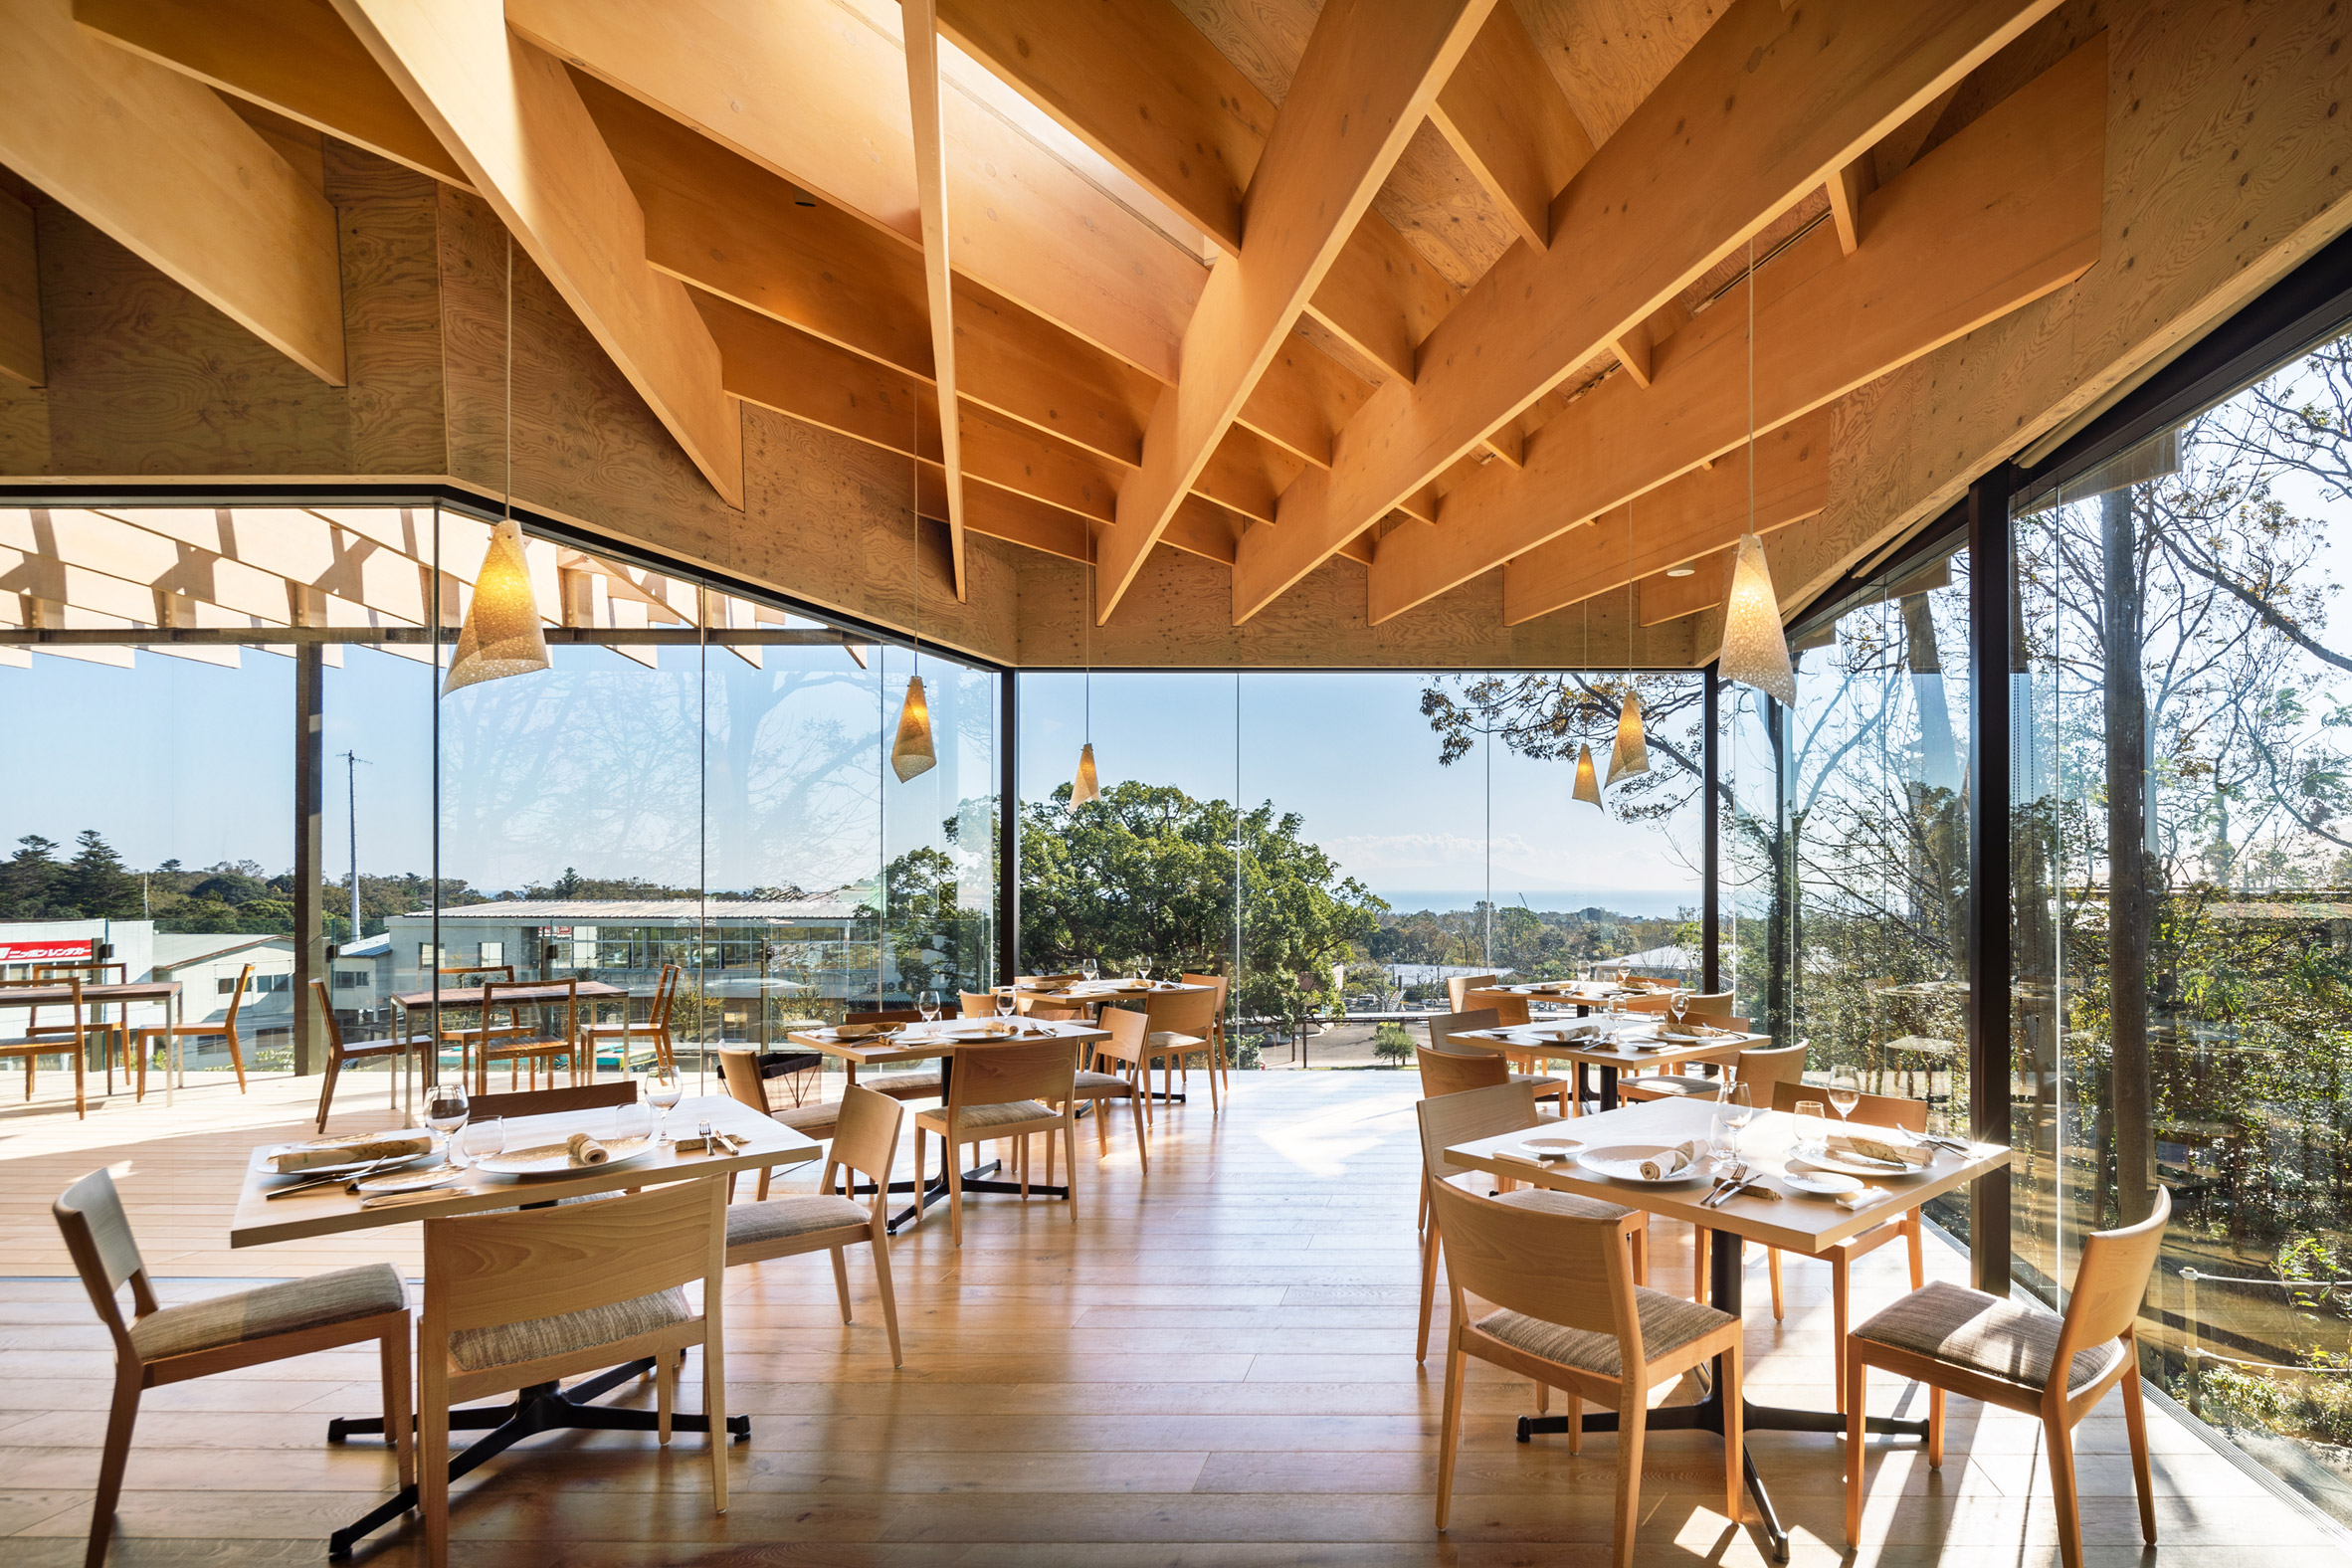 Mikuni Izukogen restaurant by Kengo Kuma